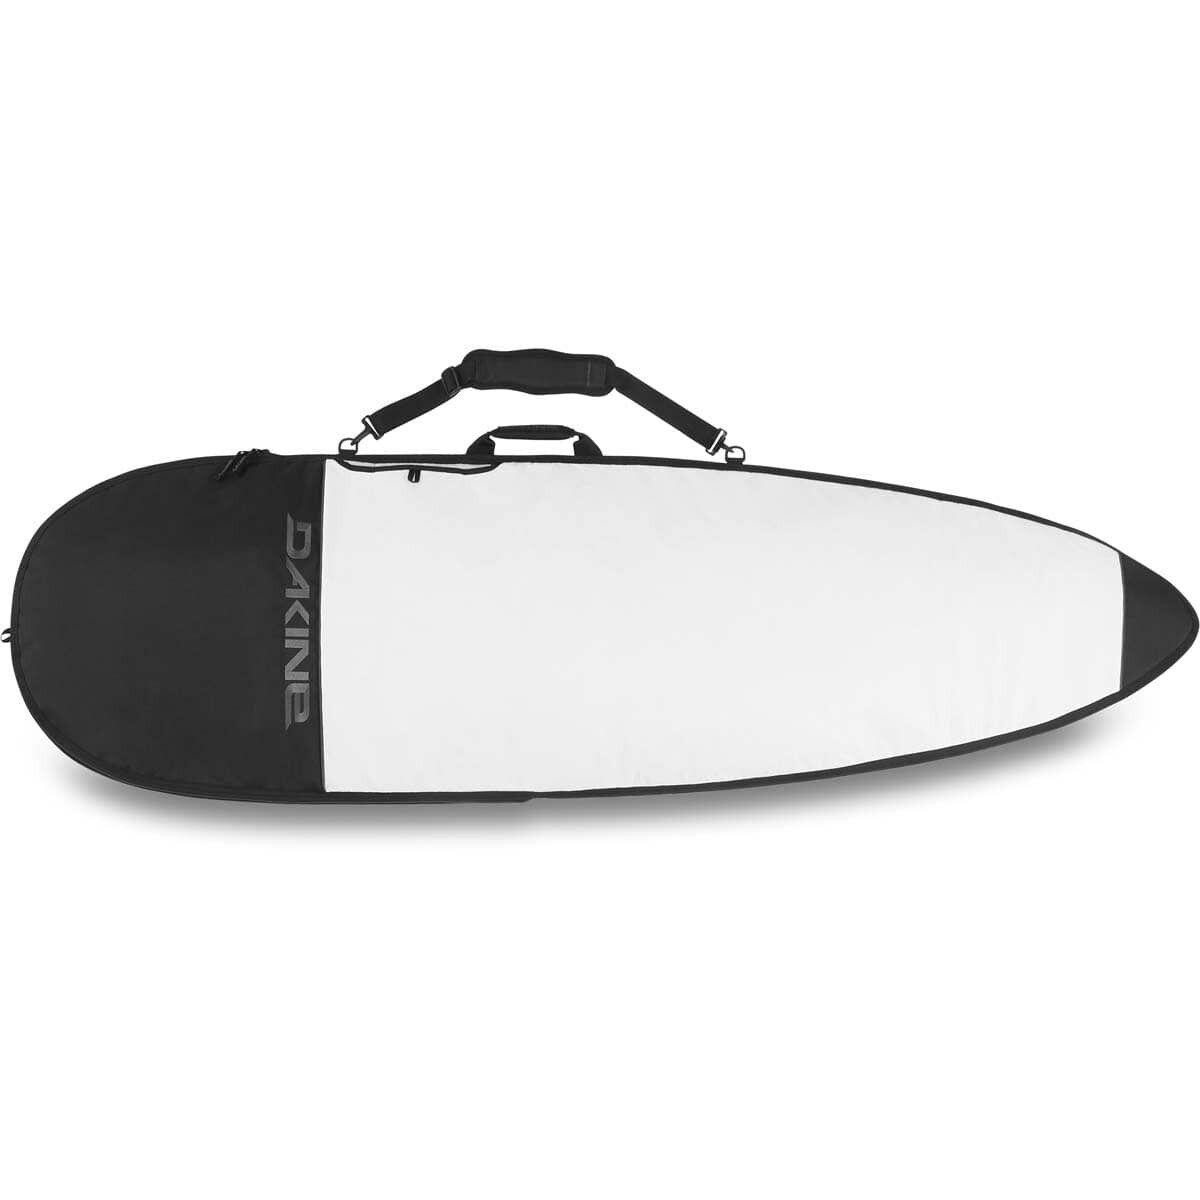 Dakine Daylight Surfboard Bag Thruster 6'6'' Surf Boardbag White